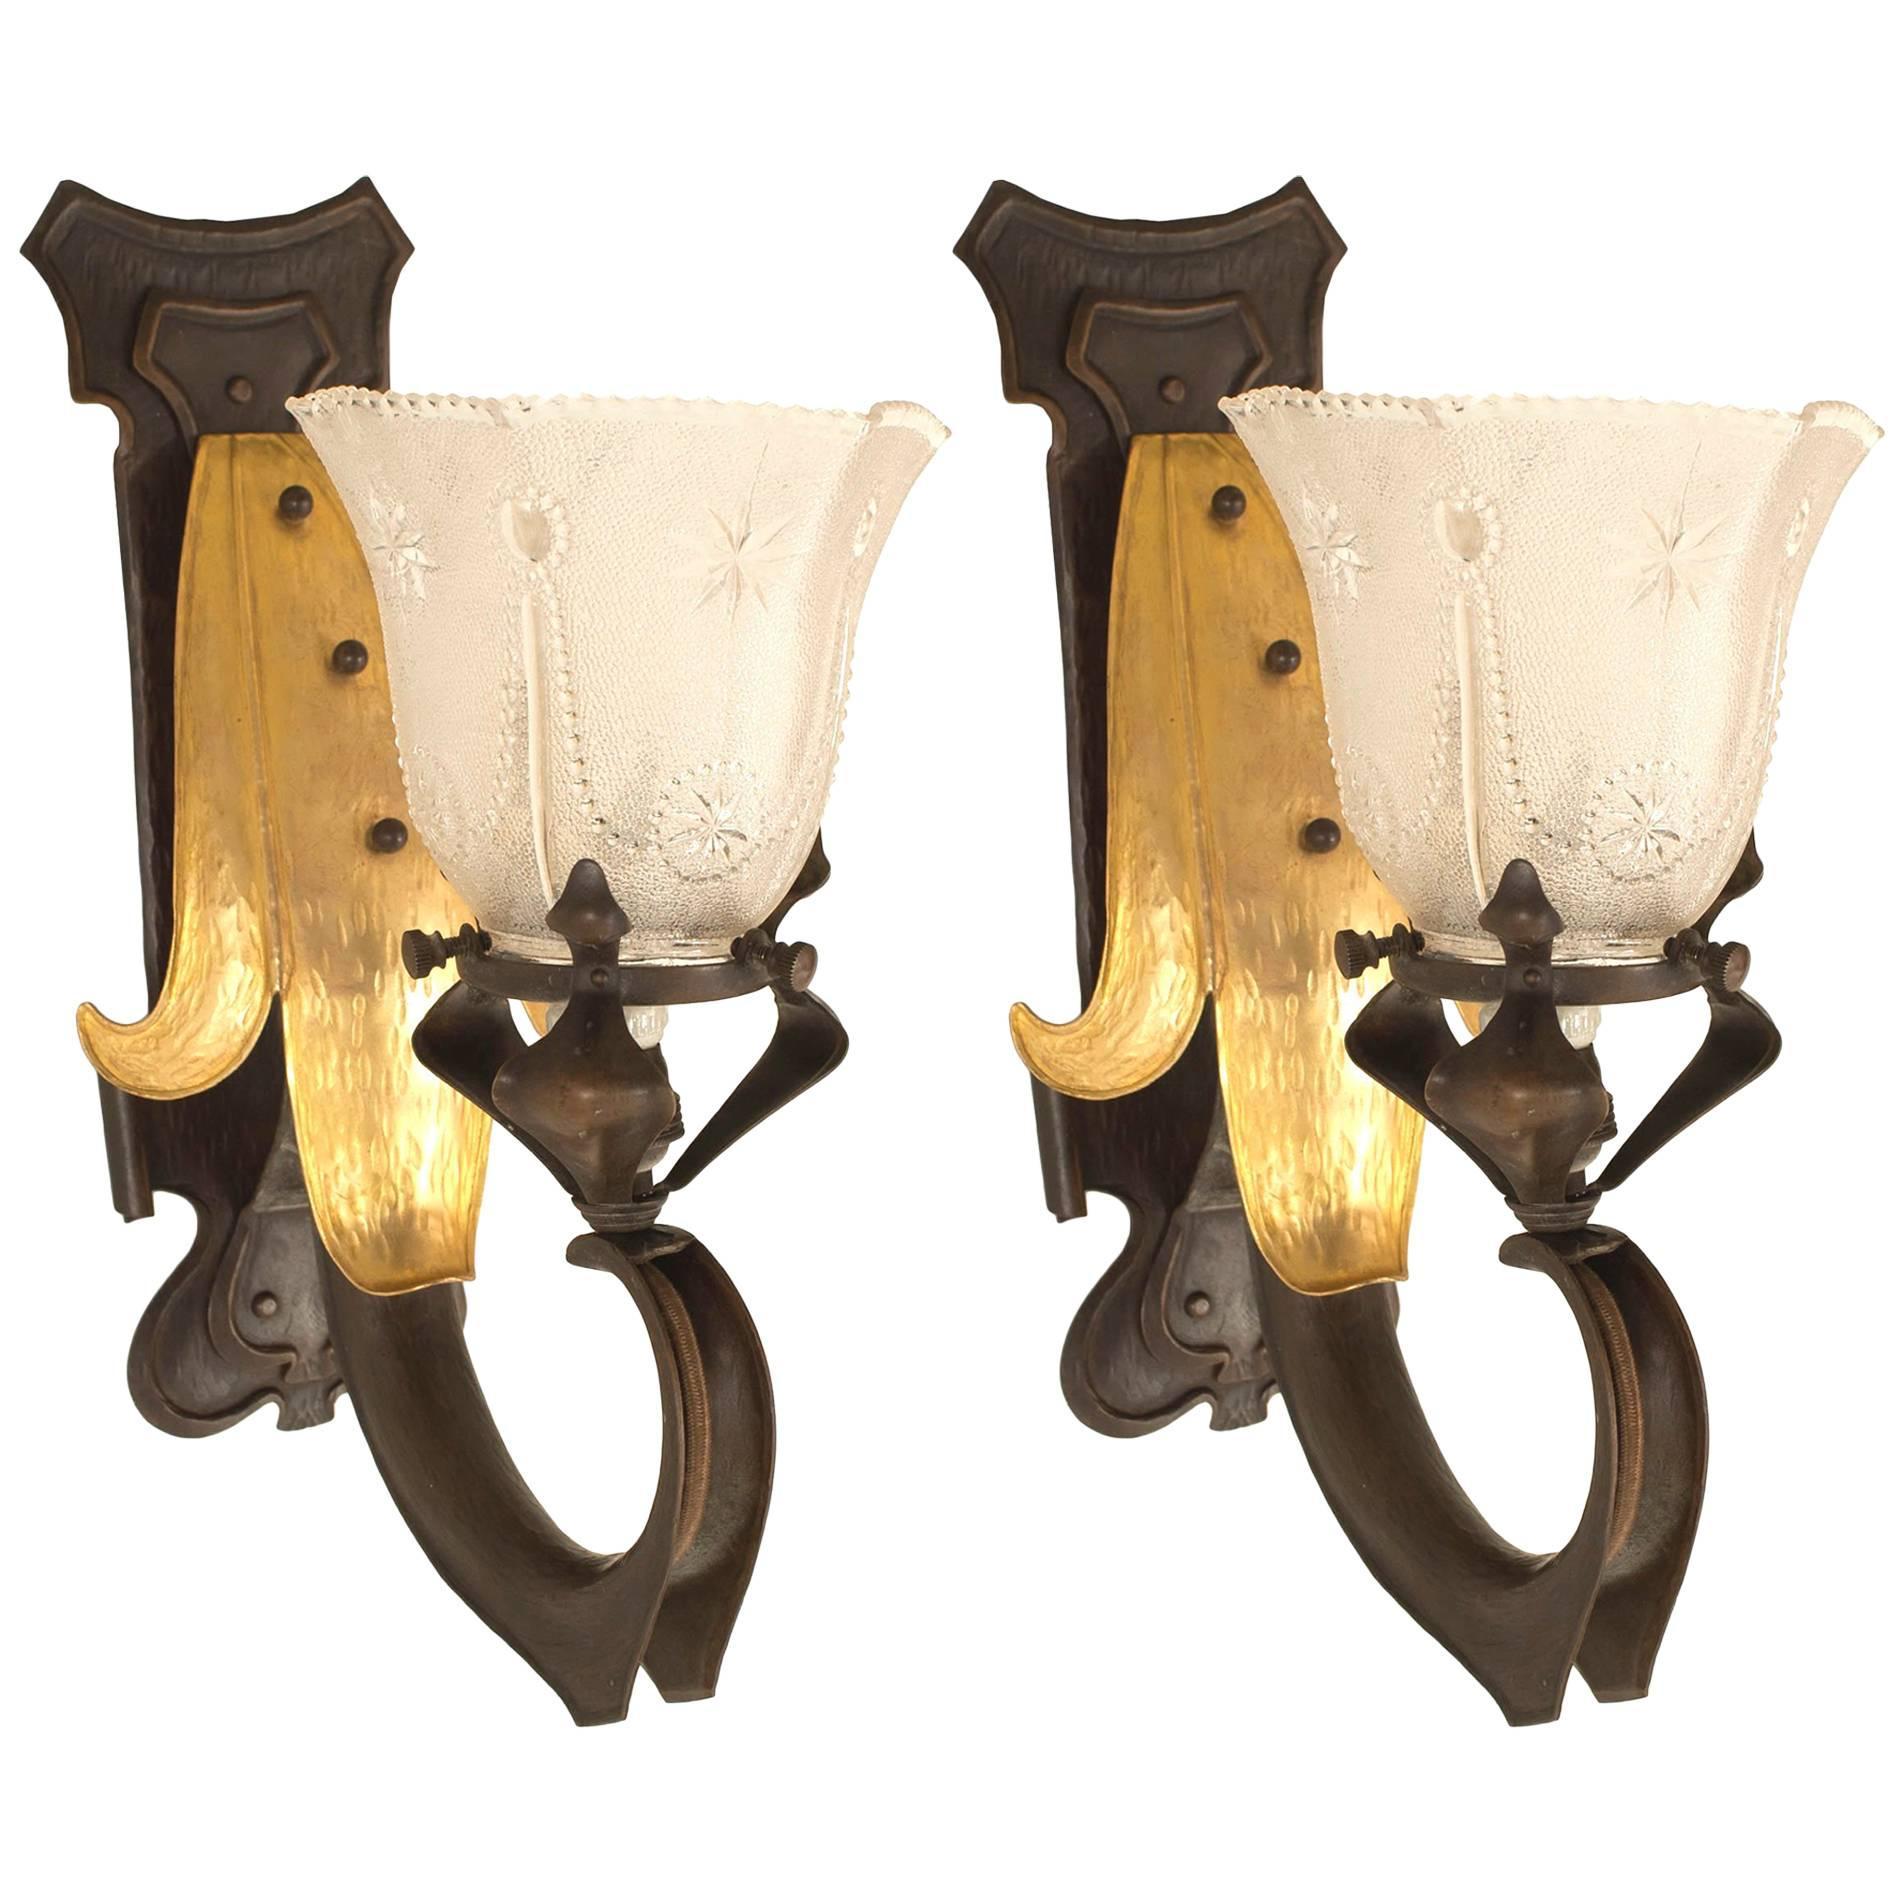 Pair of French Art Nouveau Single Arm Copper Wall Sconces